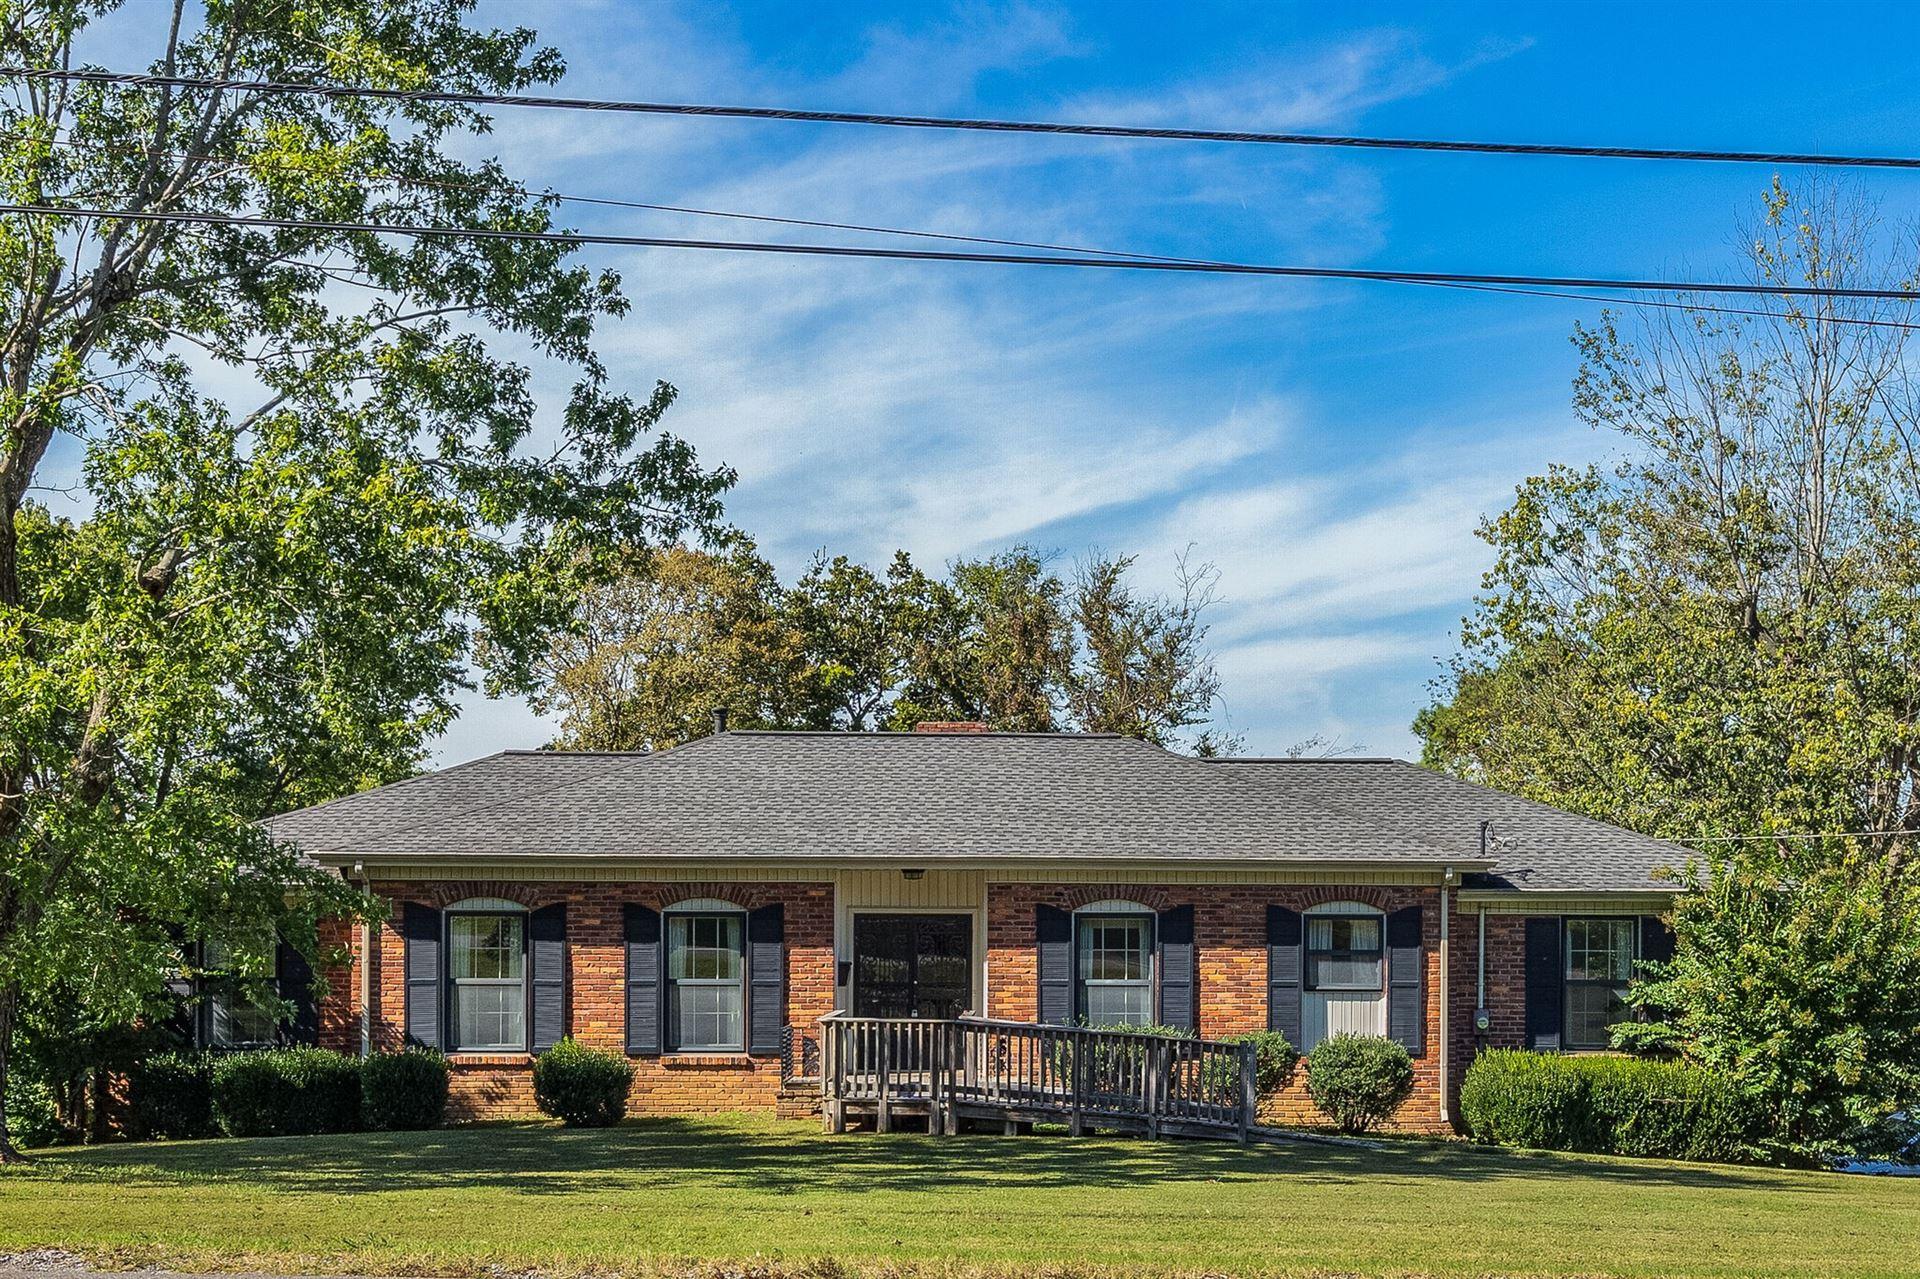 3217 Knobview Drive, Nashville, TN 37214 - MLS#: 2302186